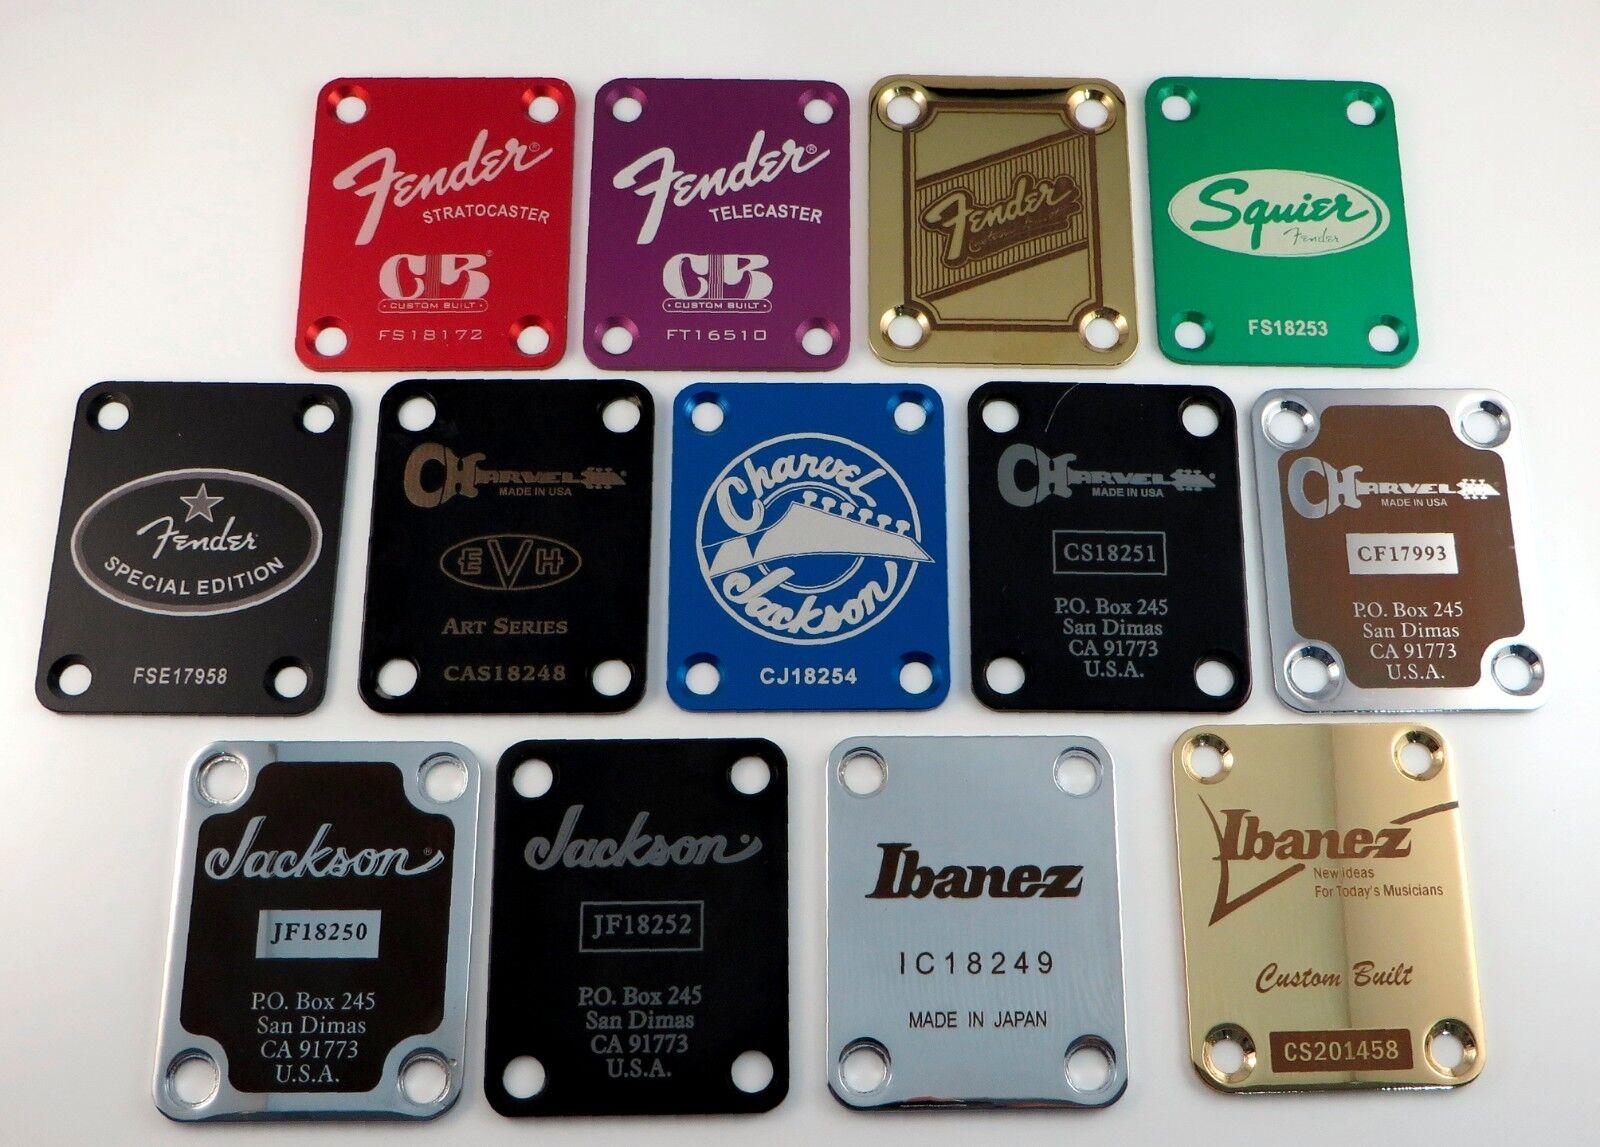 Купить Unbranded - Custom Engraved Guitar Neck Plate - Choose Design, Color and Serial Number